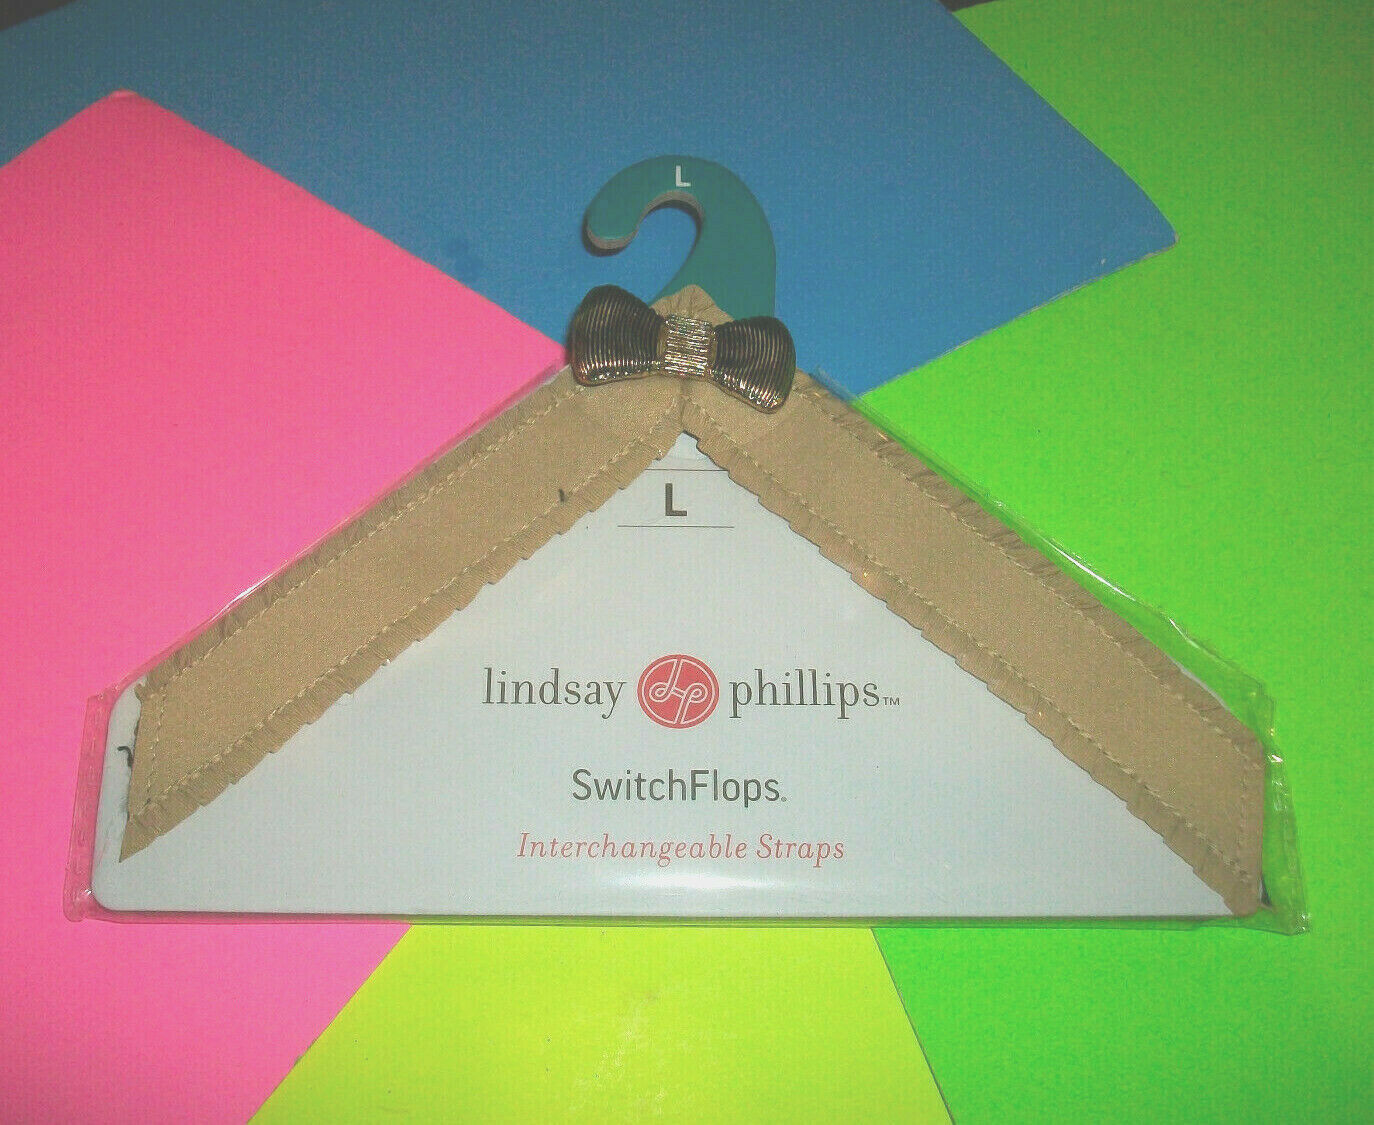 ⭐NEW⭐ LINDSAY PHILLIPS ROSALIND SWITCHFLOPS INTERCHANGEABLE STRAP STRP024 SIZE L